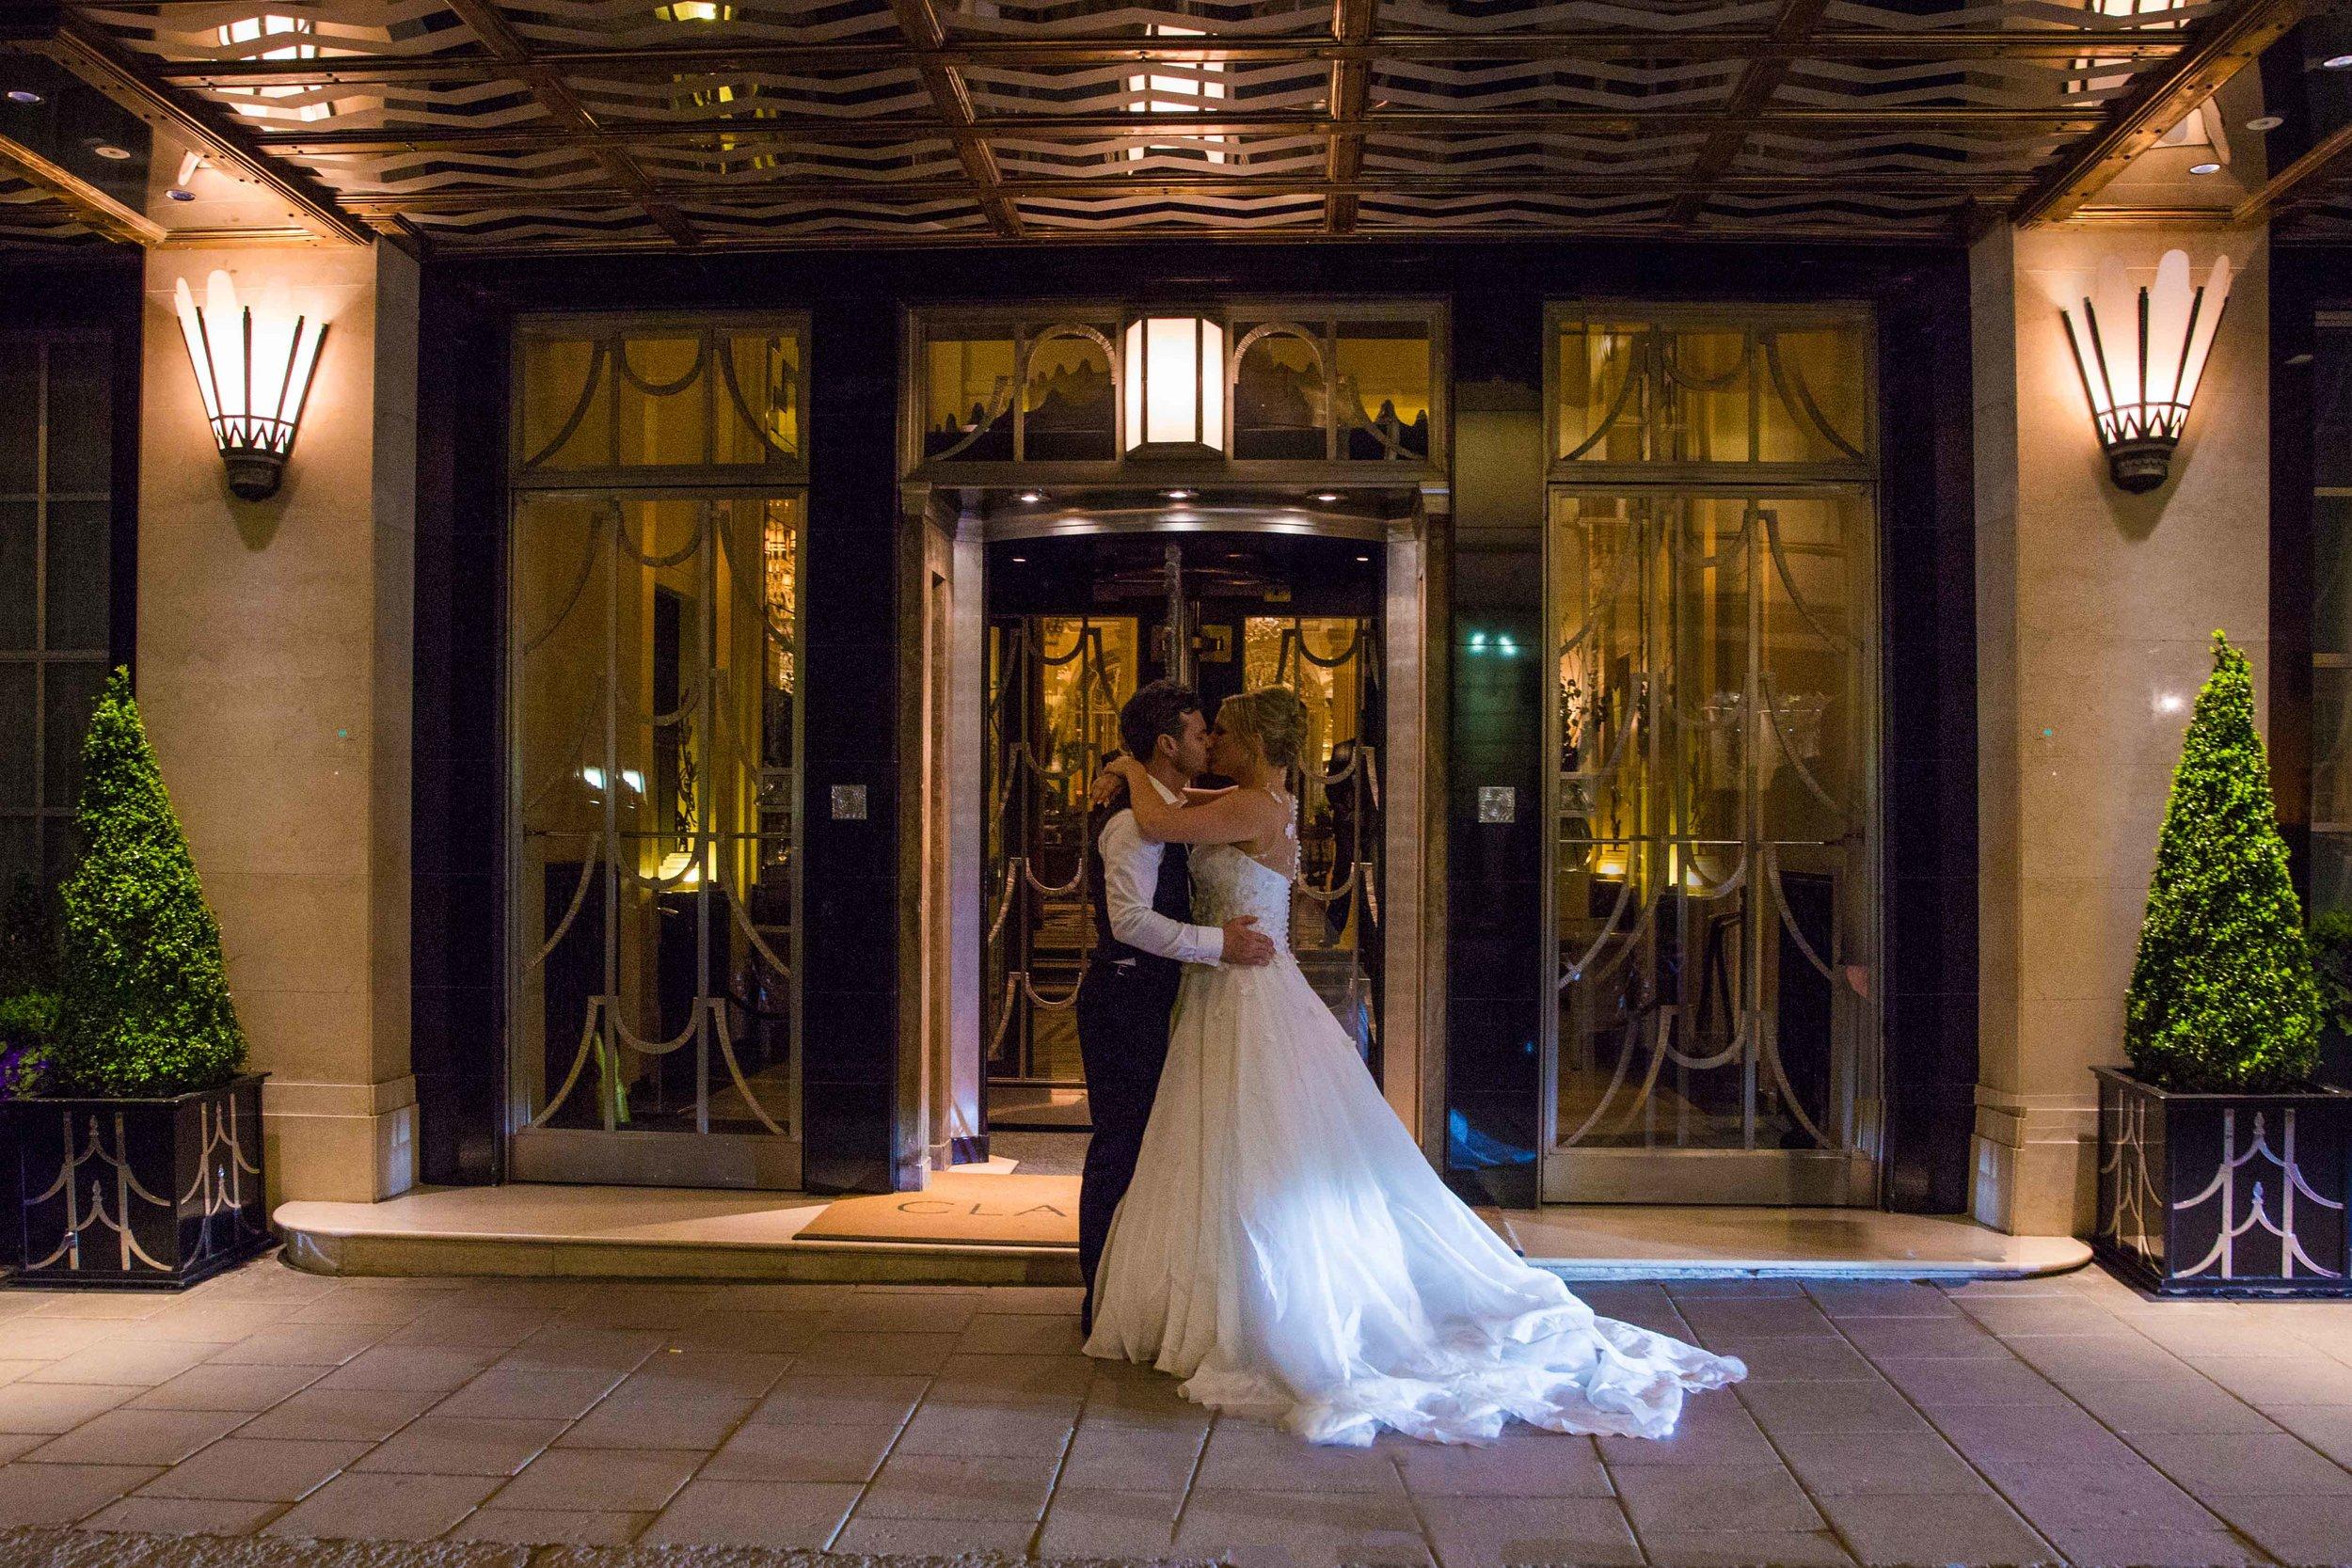 claridges-hotel-wedding-photographer-london-mayfair-natalia-smith-photography-165.jpg